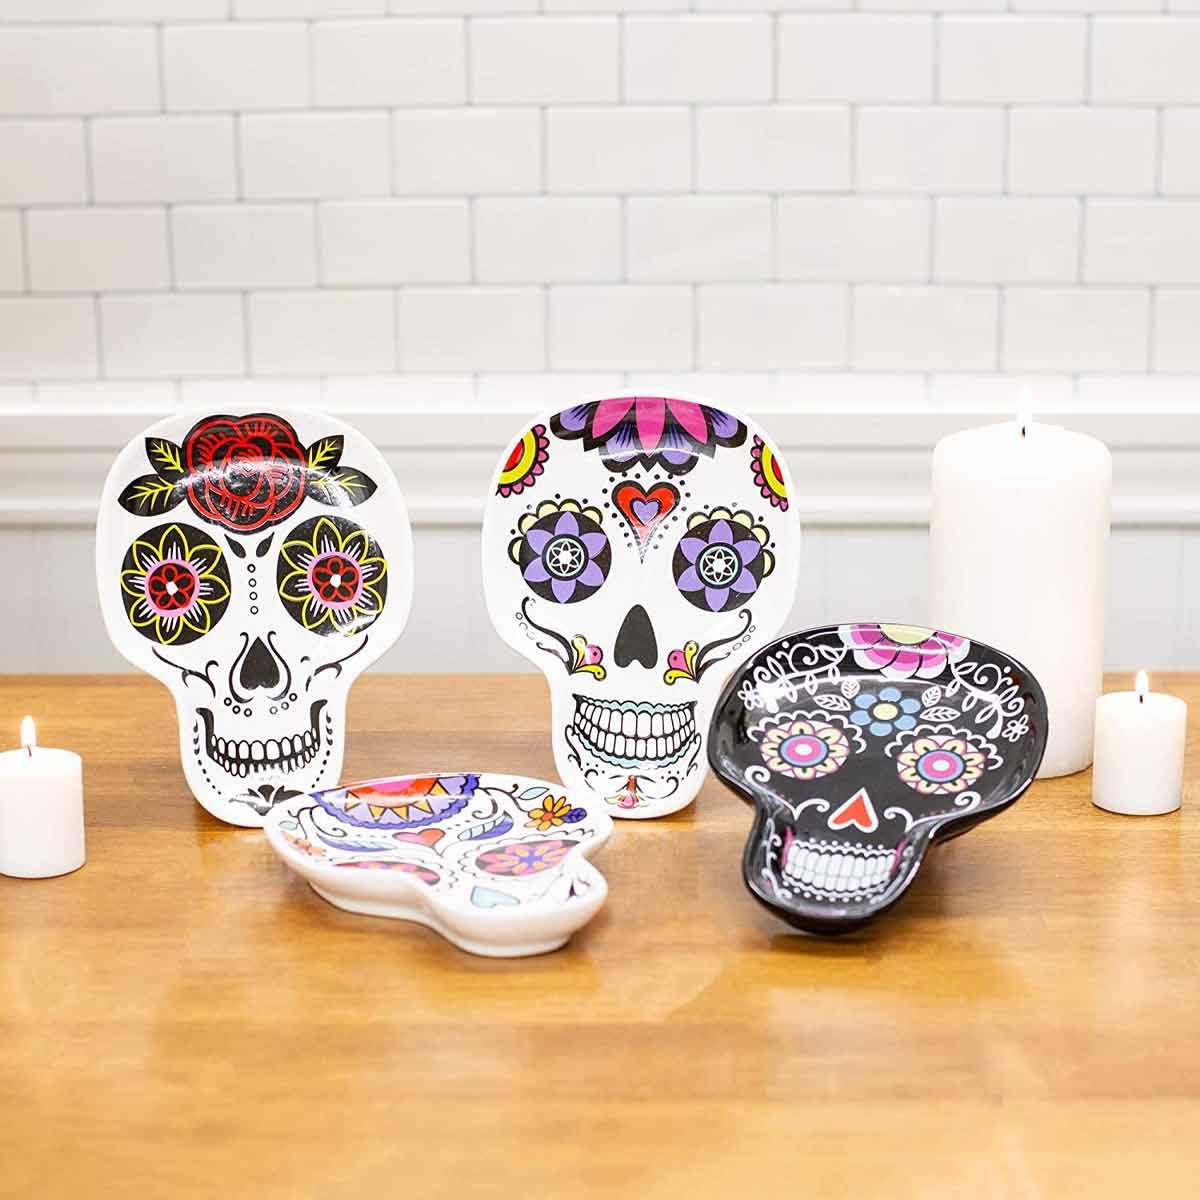 Calavera Ceramic Day Of The Dead Plates on Counter